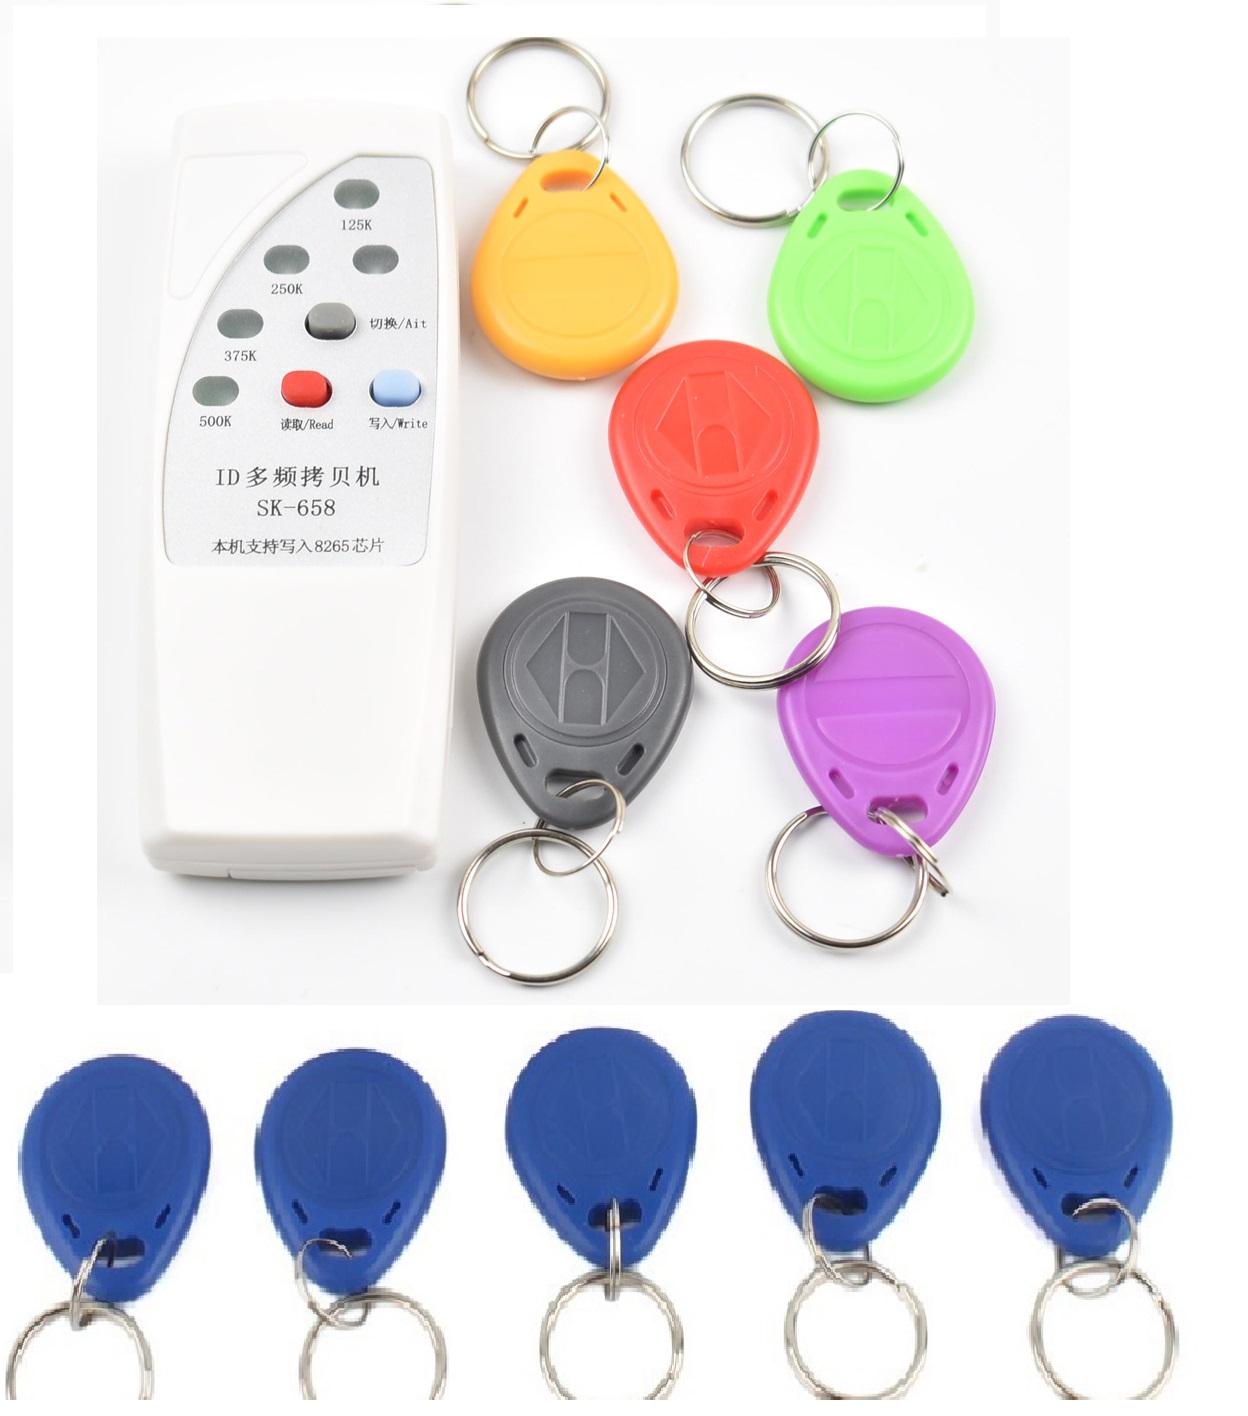 4 frequency RFID Copier/ Duplicator/ Cloner ID EM reader & writer+ 10 pcs  EM4305 T5577 writable keyfob - Eclats Antivols